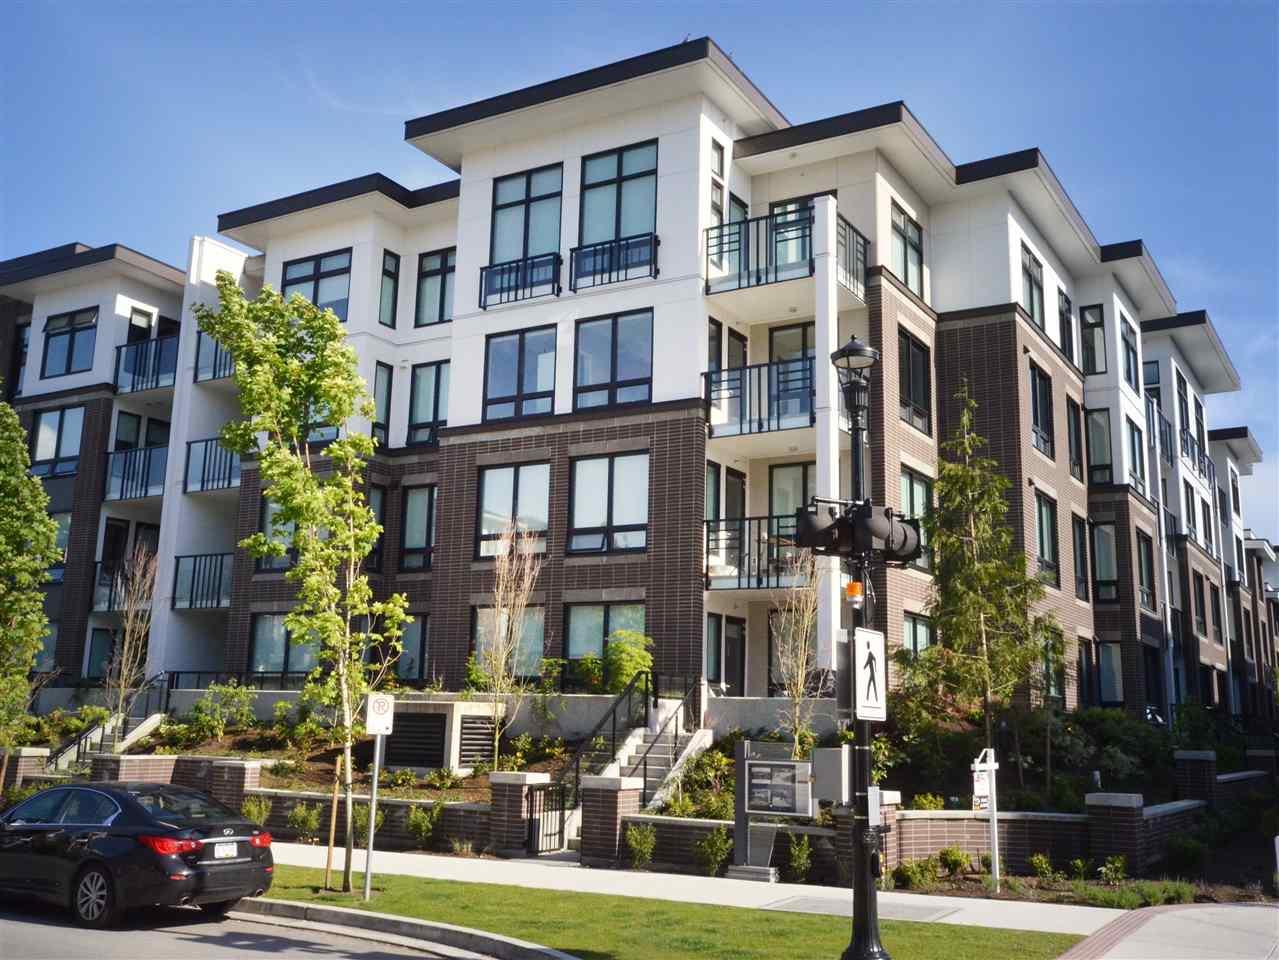 Sold: 332 - 9388 Odlin Road, Richmond, BC